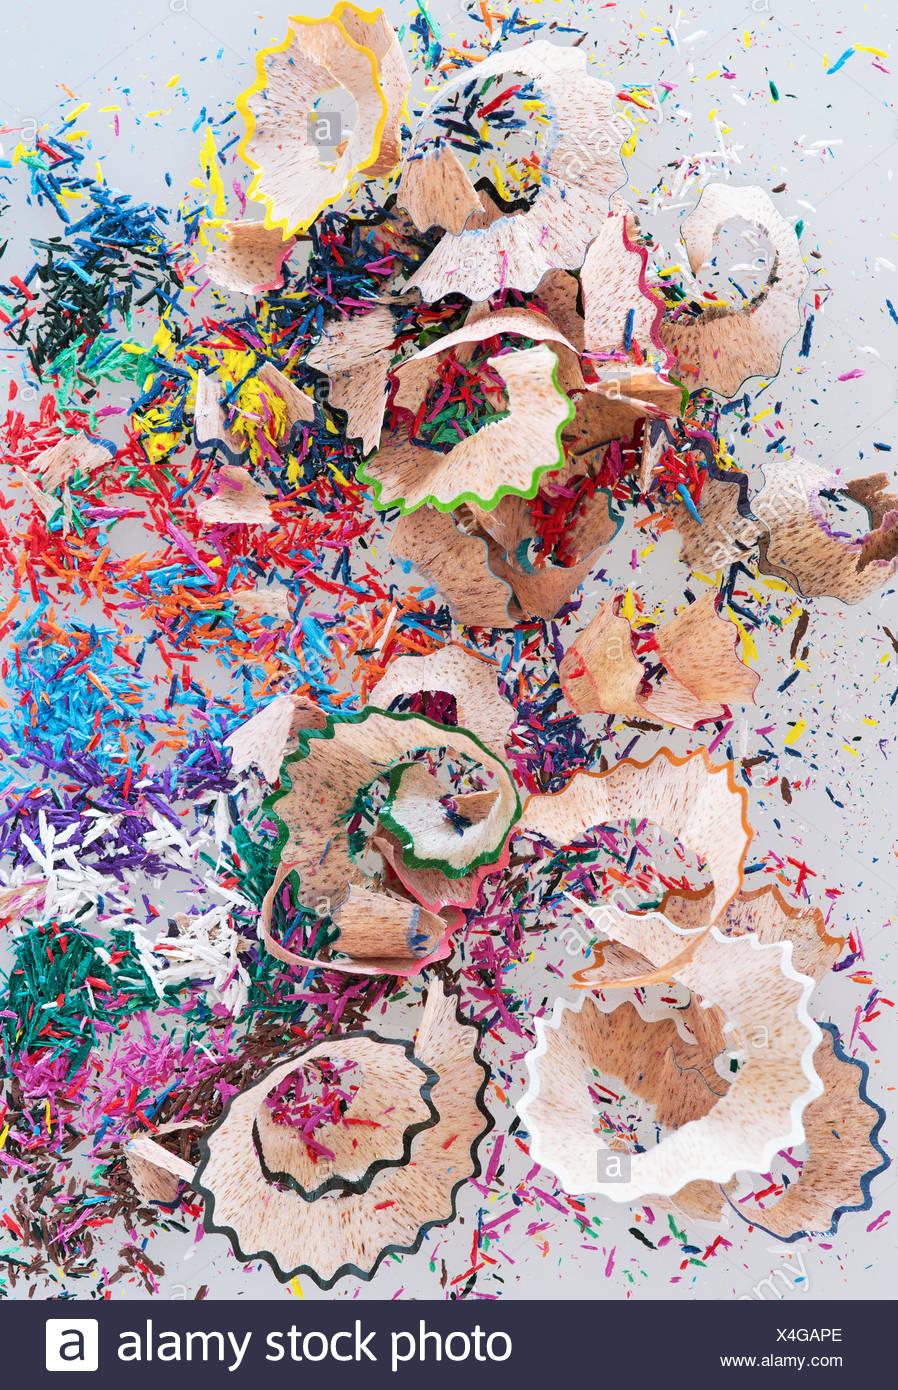 Studio shot of multi colored pencil shavings - Stock Image